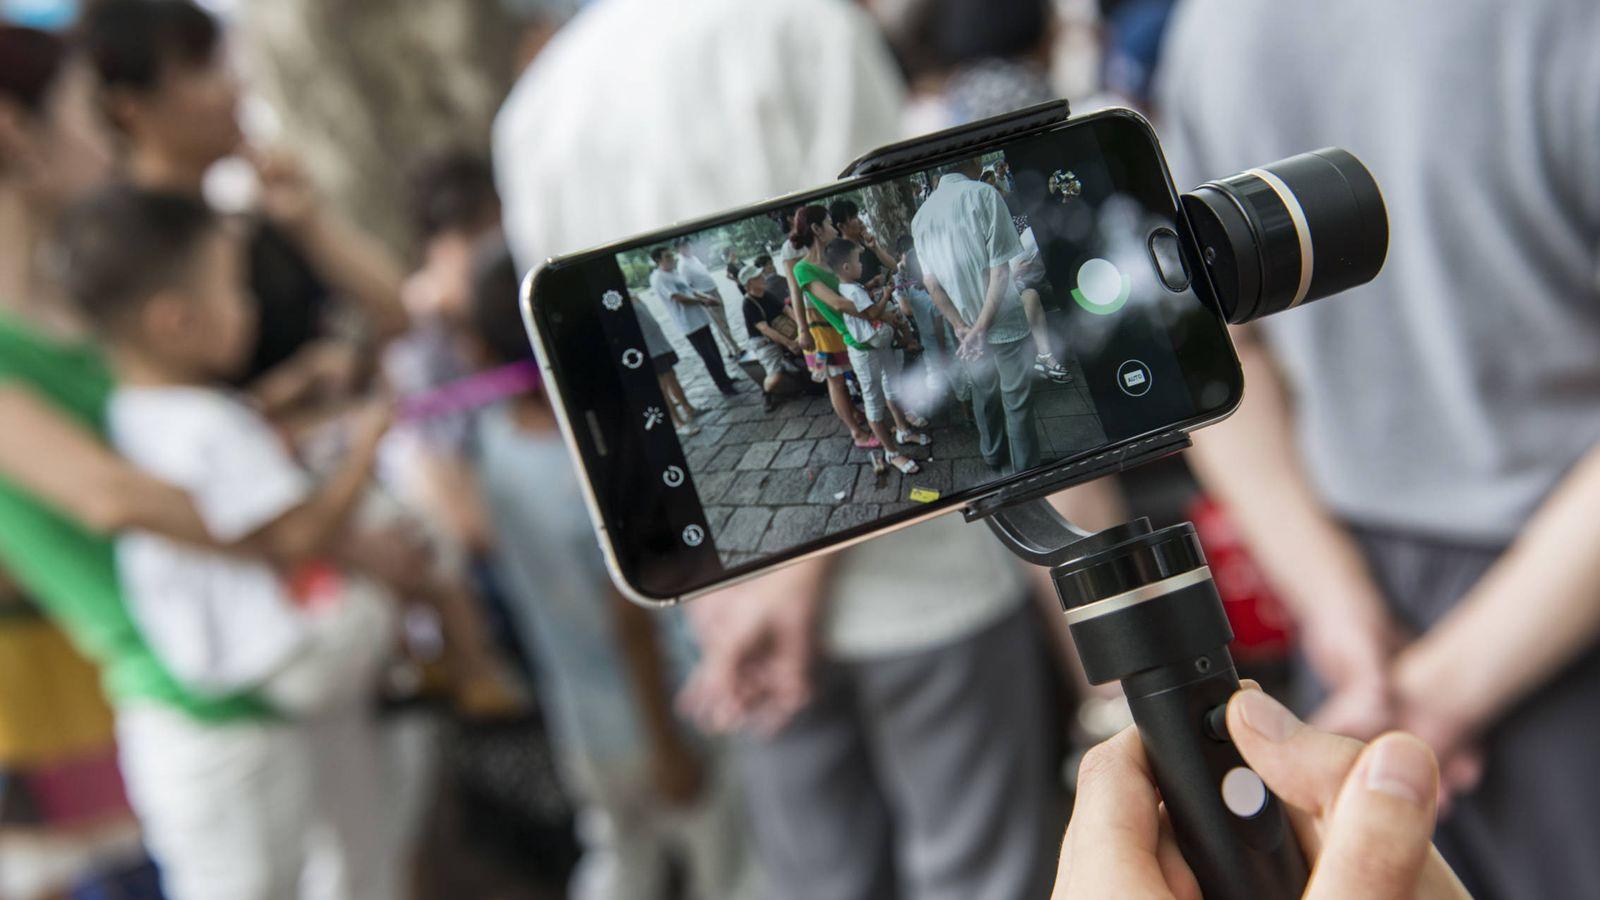 Vídeo: Probamos el Feiyu G4Pro, un estabilizador para